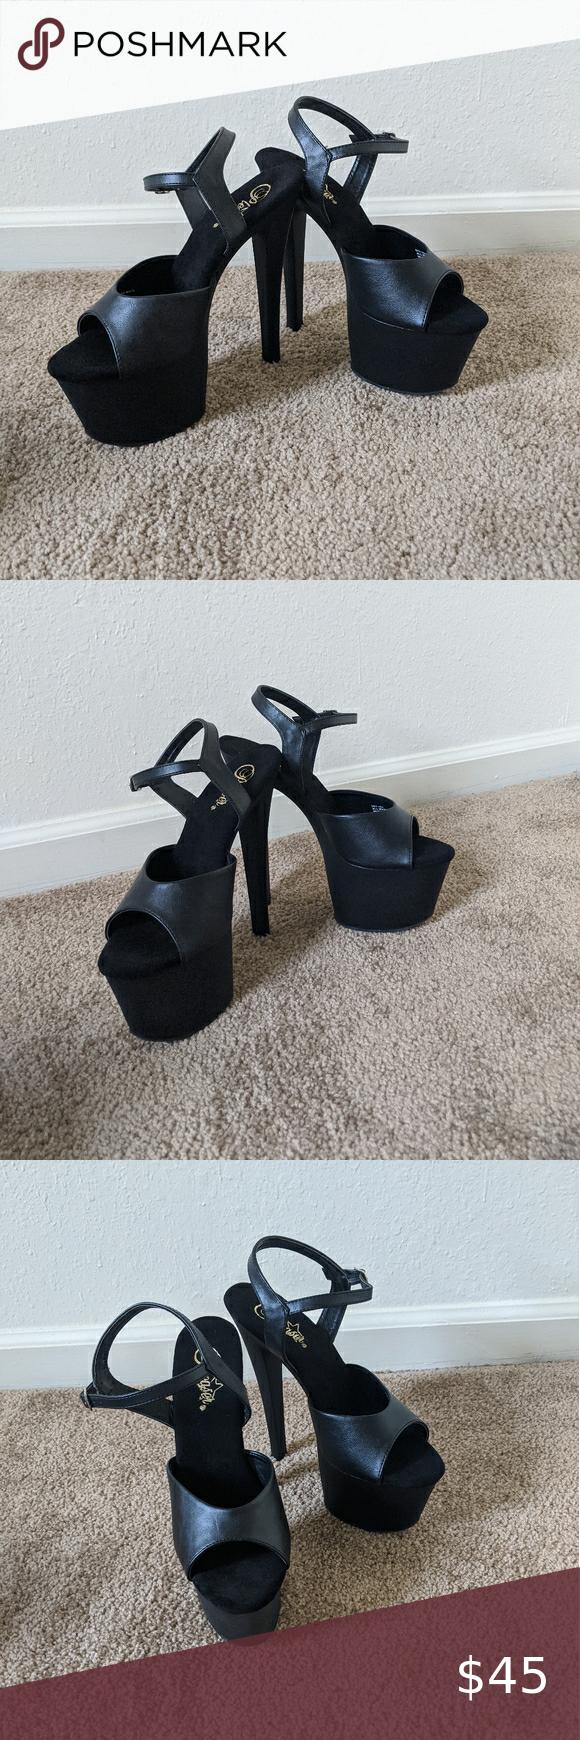 Black Platform Heels By Pleaser size 9